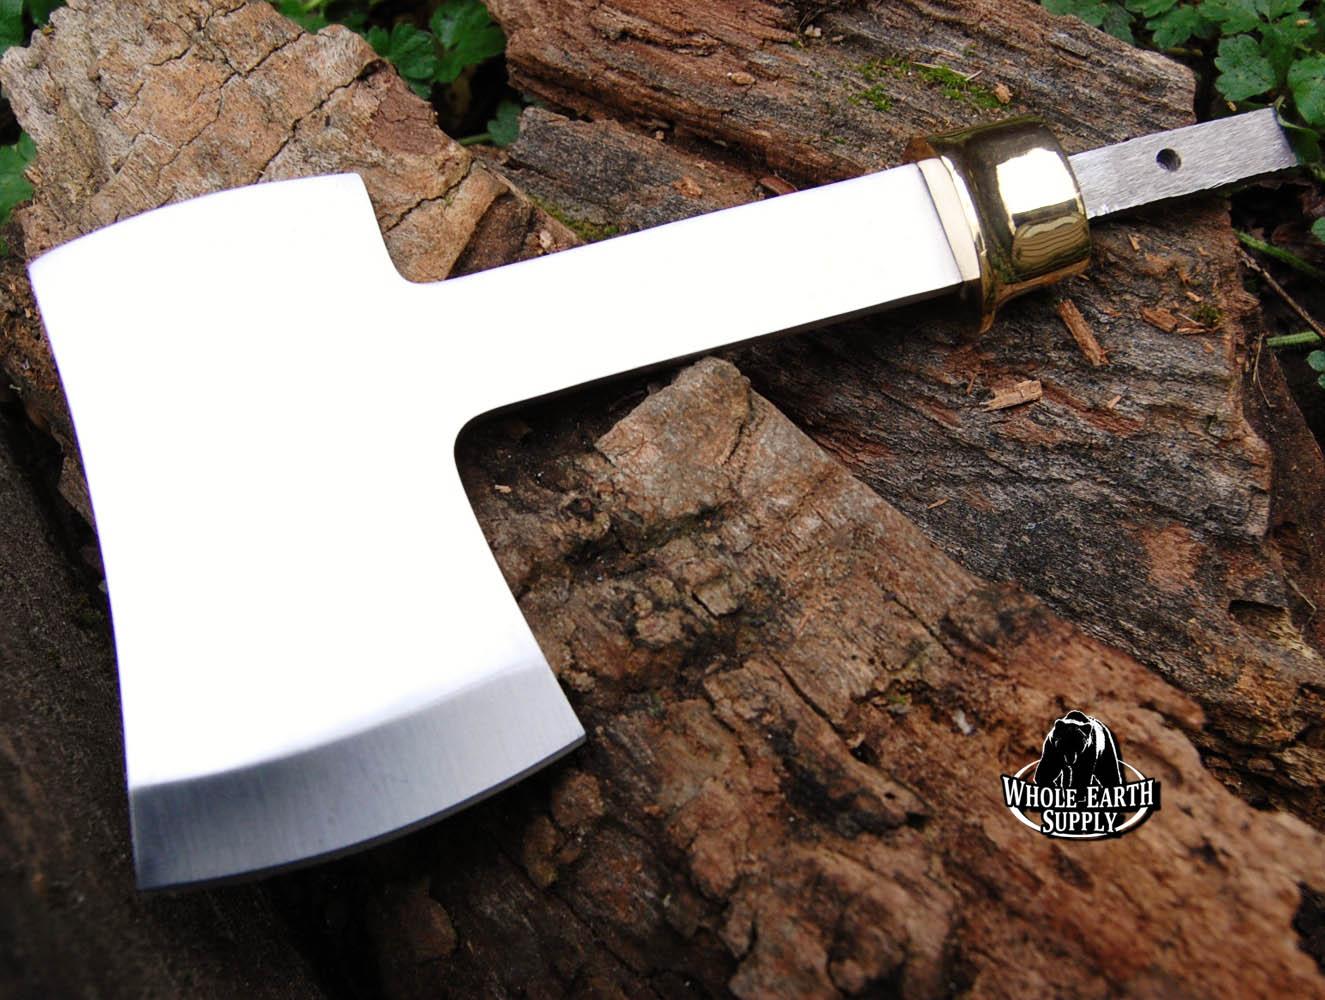 Damascus-Blades com - CUSTOM BLANK Axe Head Knife making Blade with